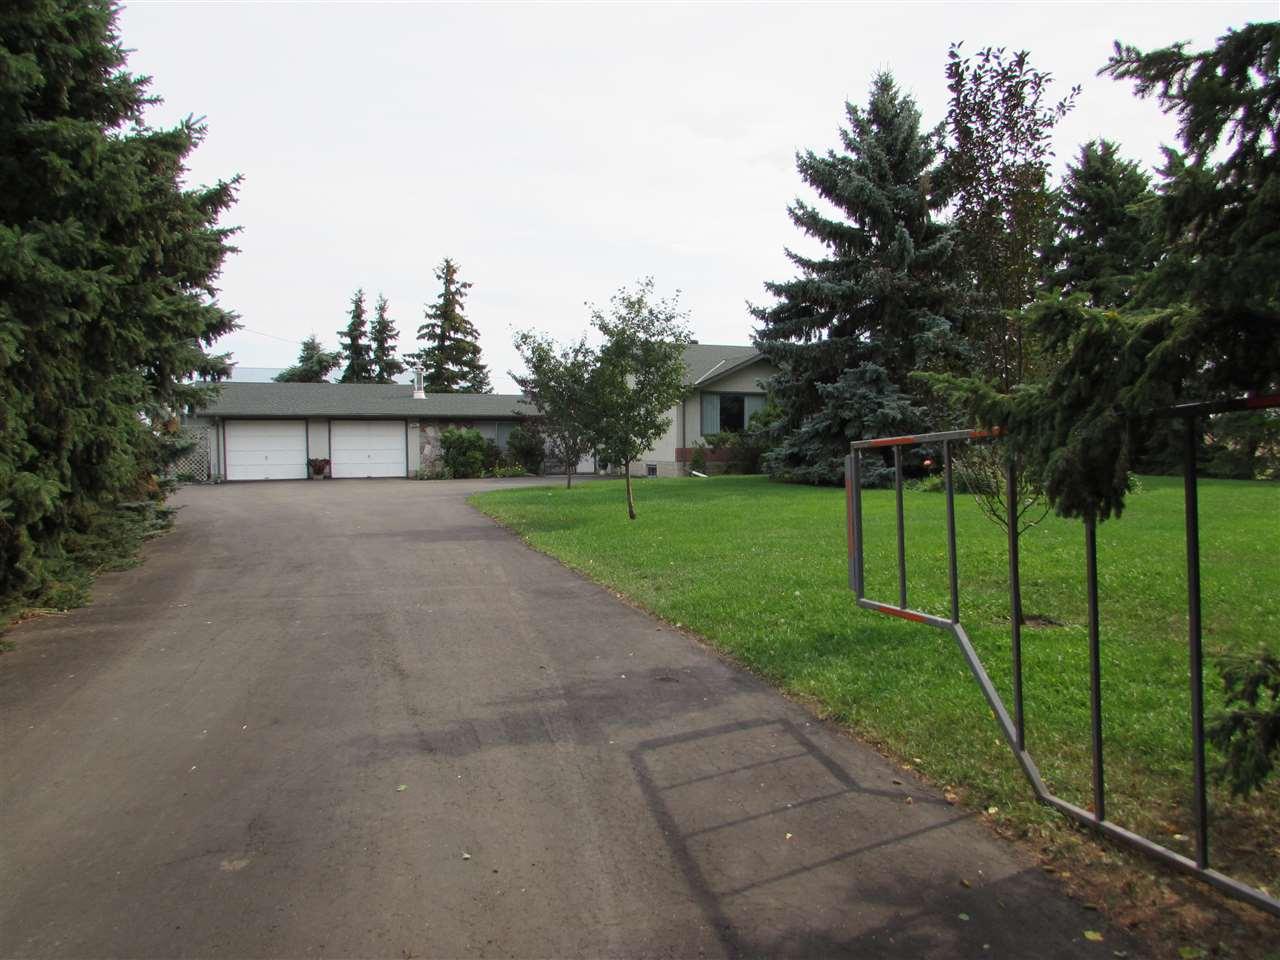 54025 Range Road 220, Rural Strathcona County, MLS® # E4159006